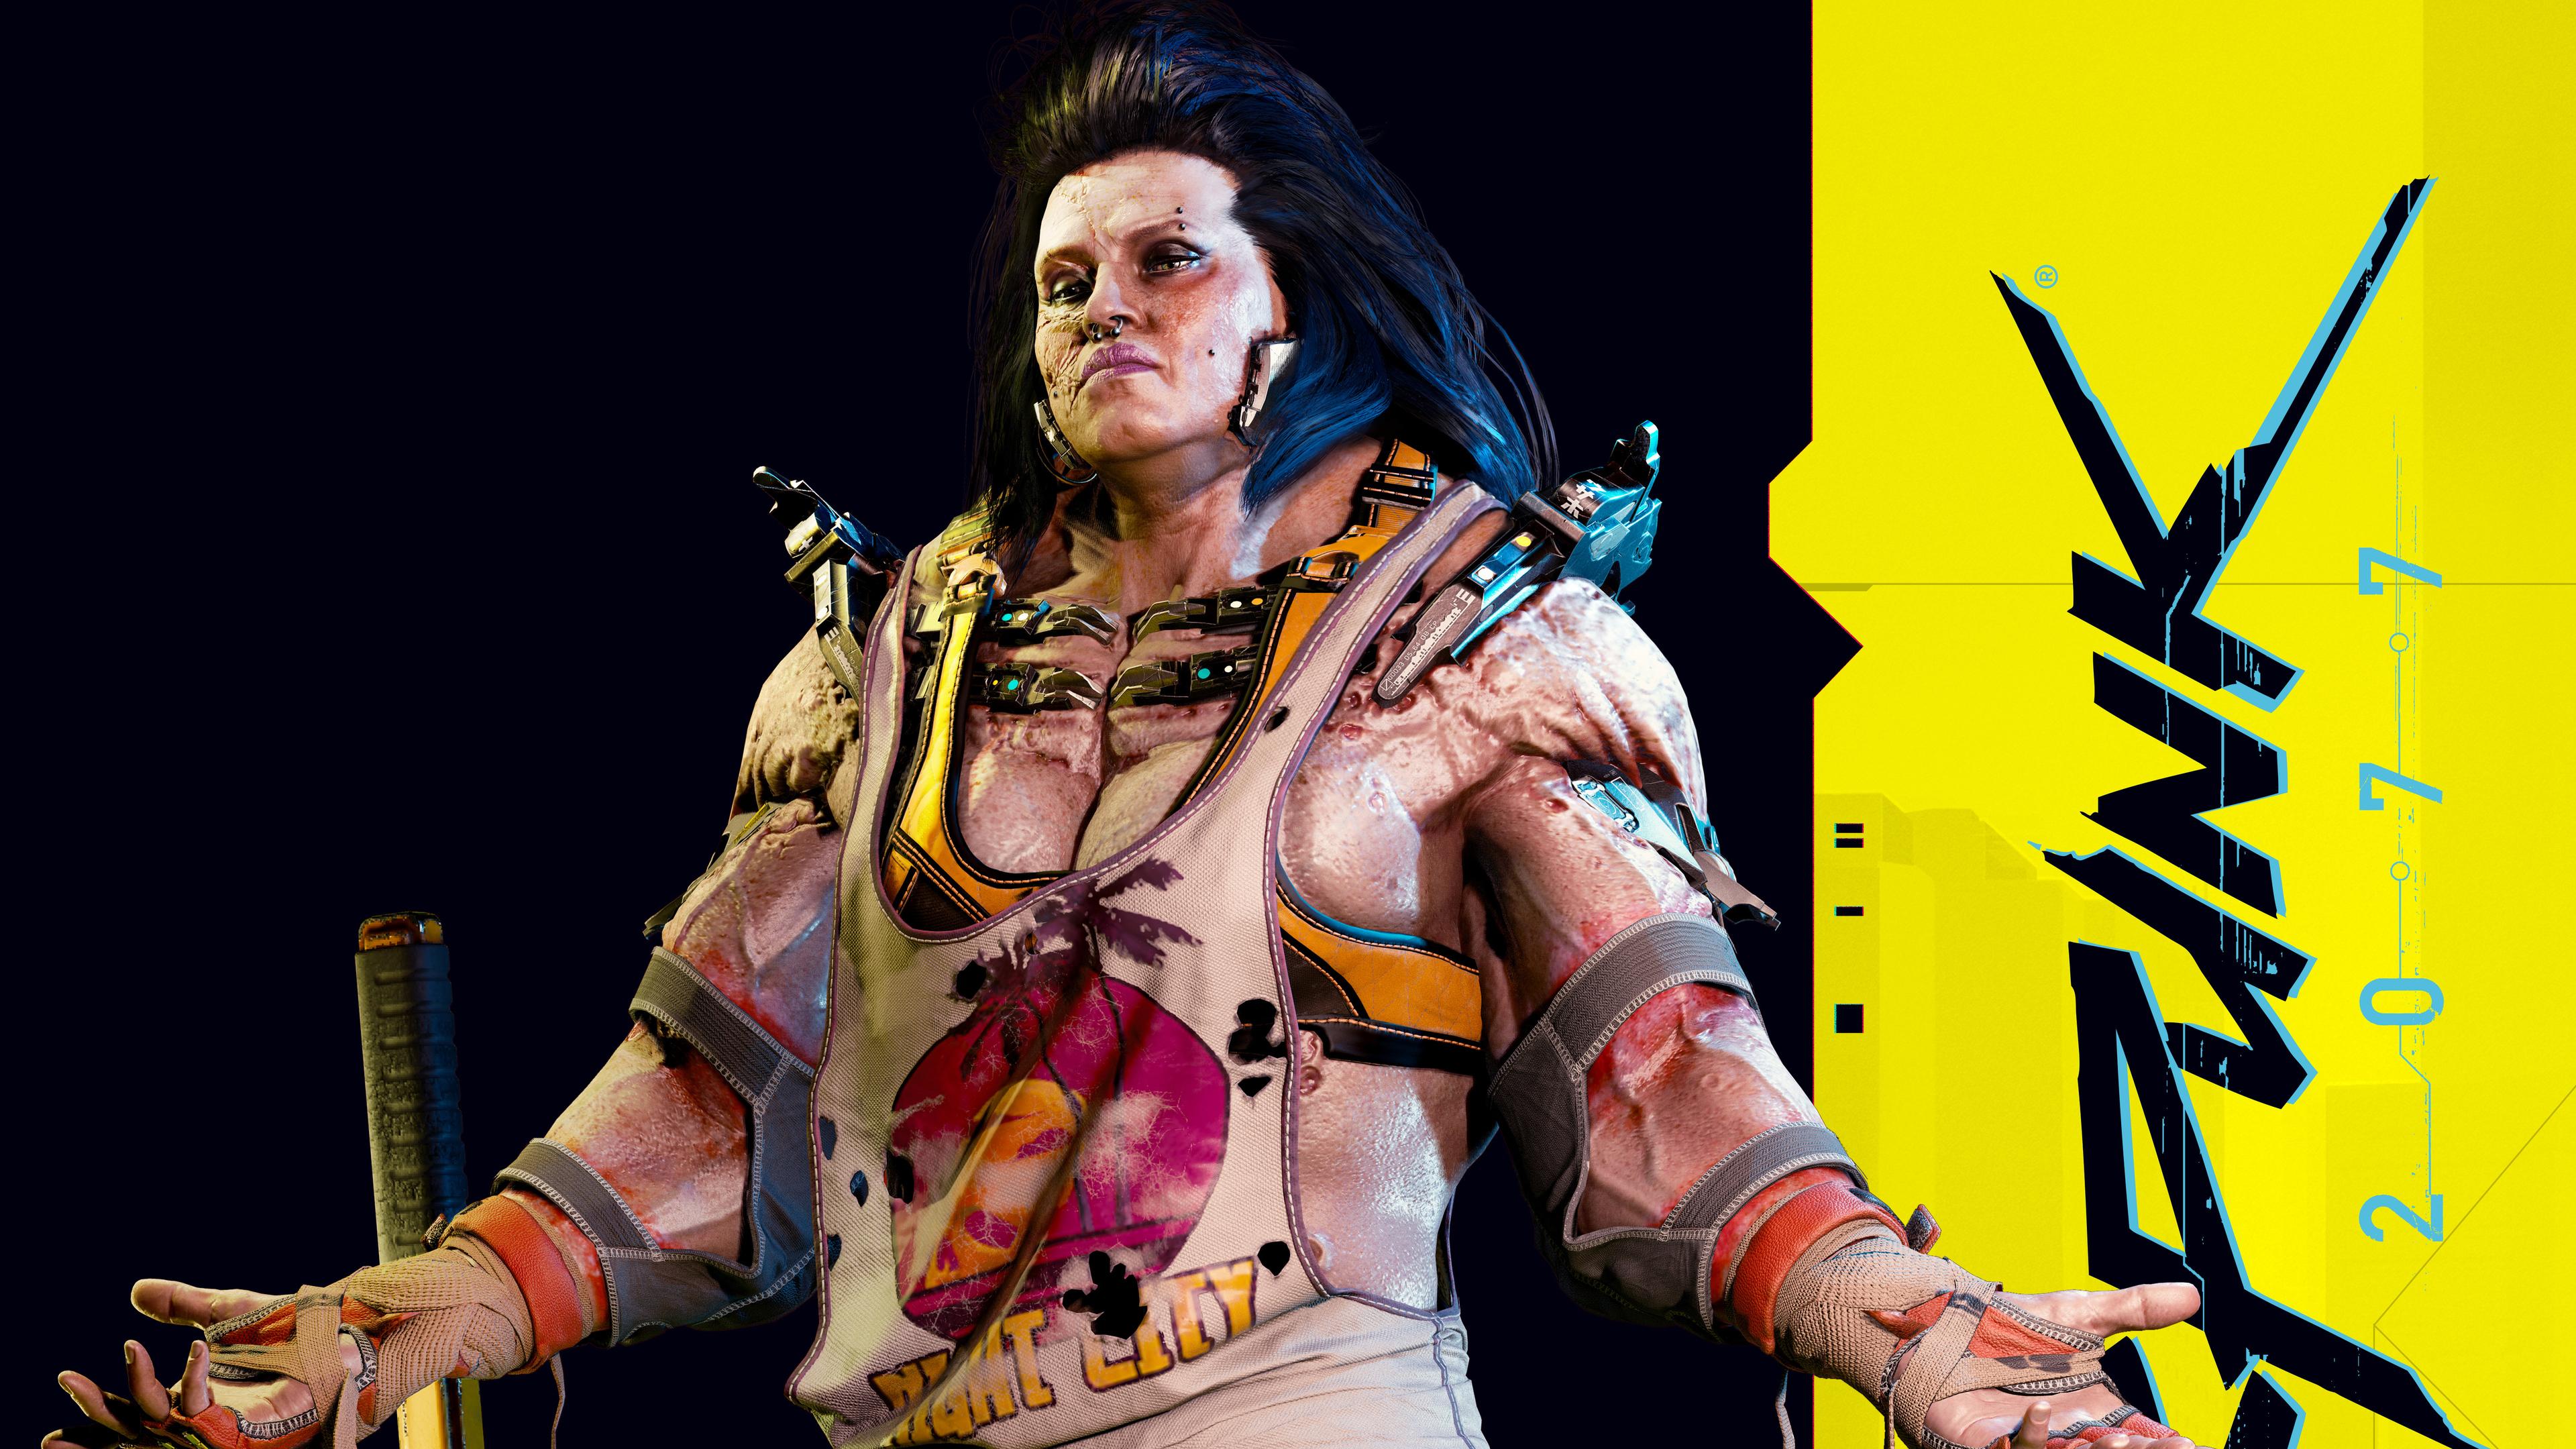 cyberpunk 2077 characters 1568056674 - Cyberpunk 2077 Characters - hd-wallpapers, games wallpapers, cyberpunk 2077 wallpapers, 5k wallpapers, 4k-wallpapers